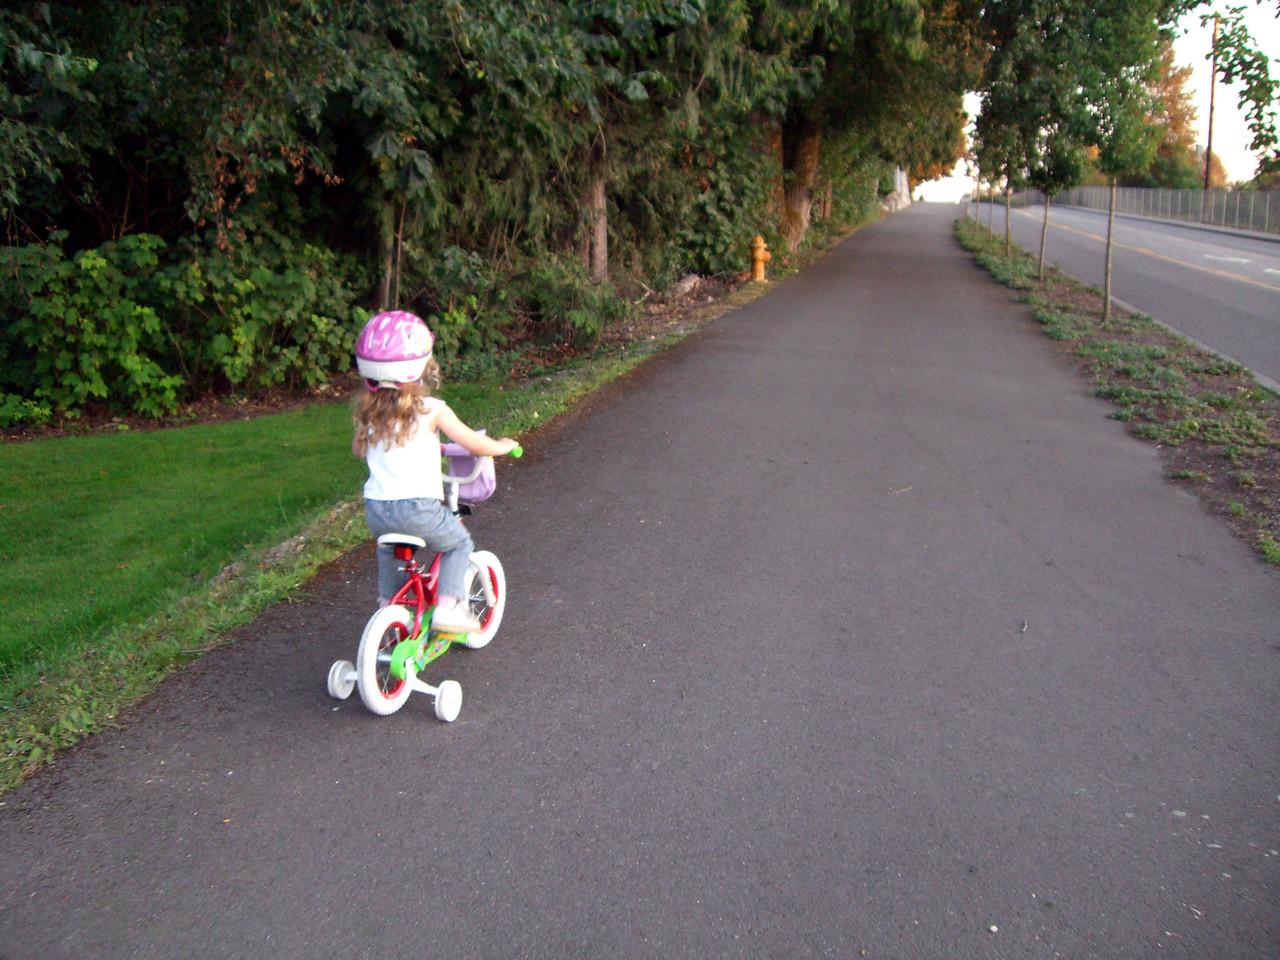 Riding her first bike!